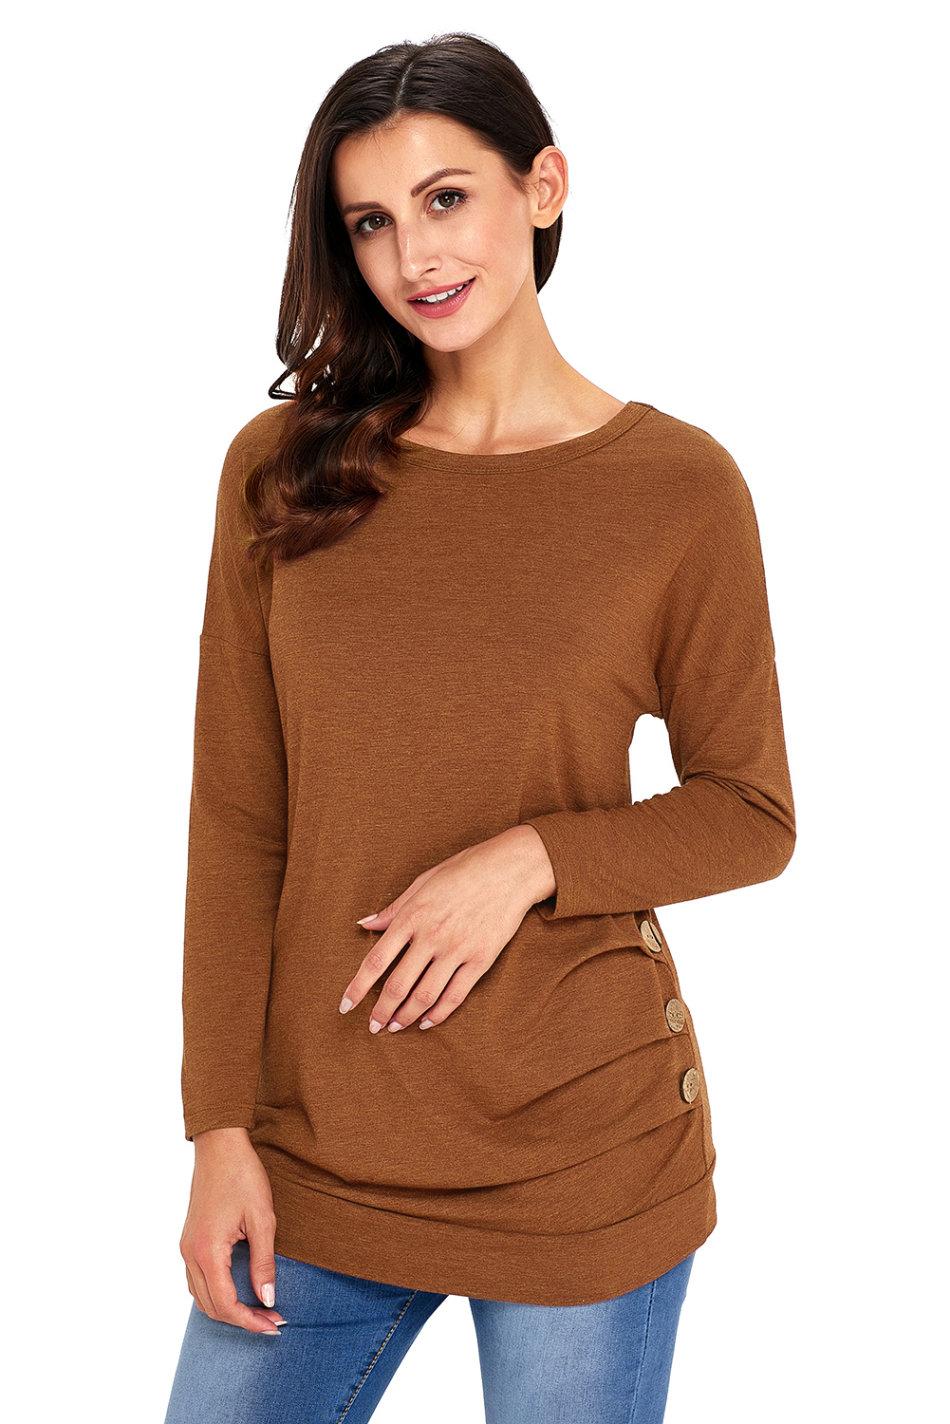 Elegant Womens Dark Brown Blouse - Collar Blouses